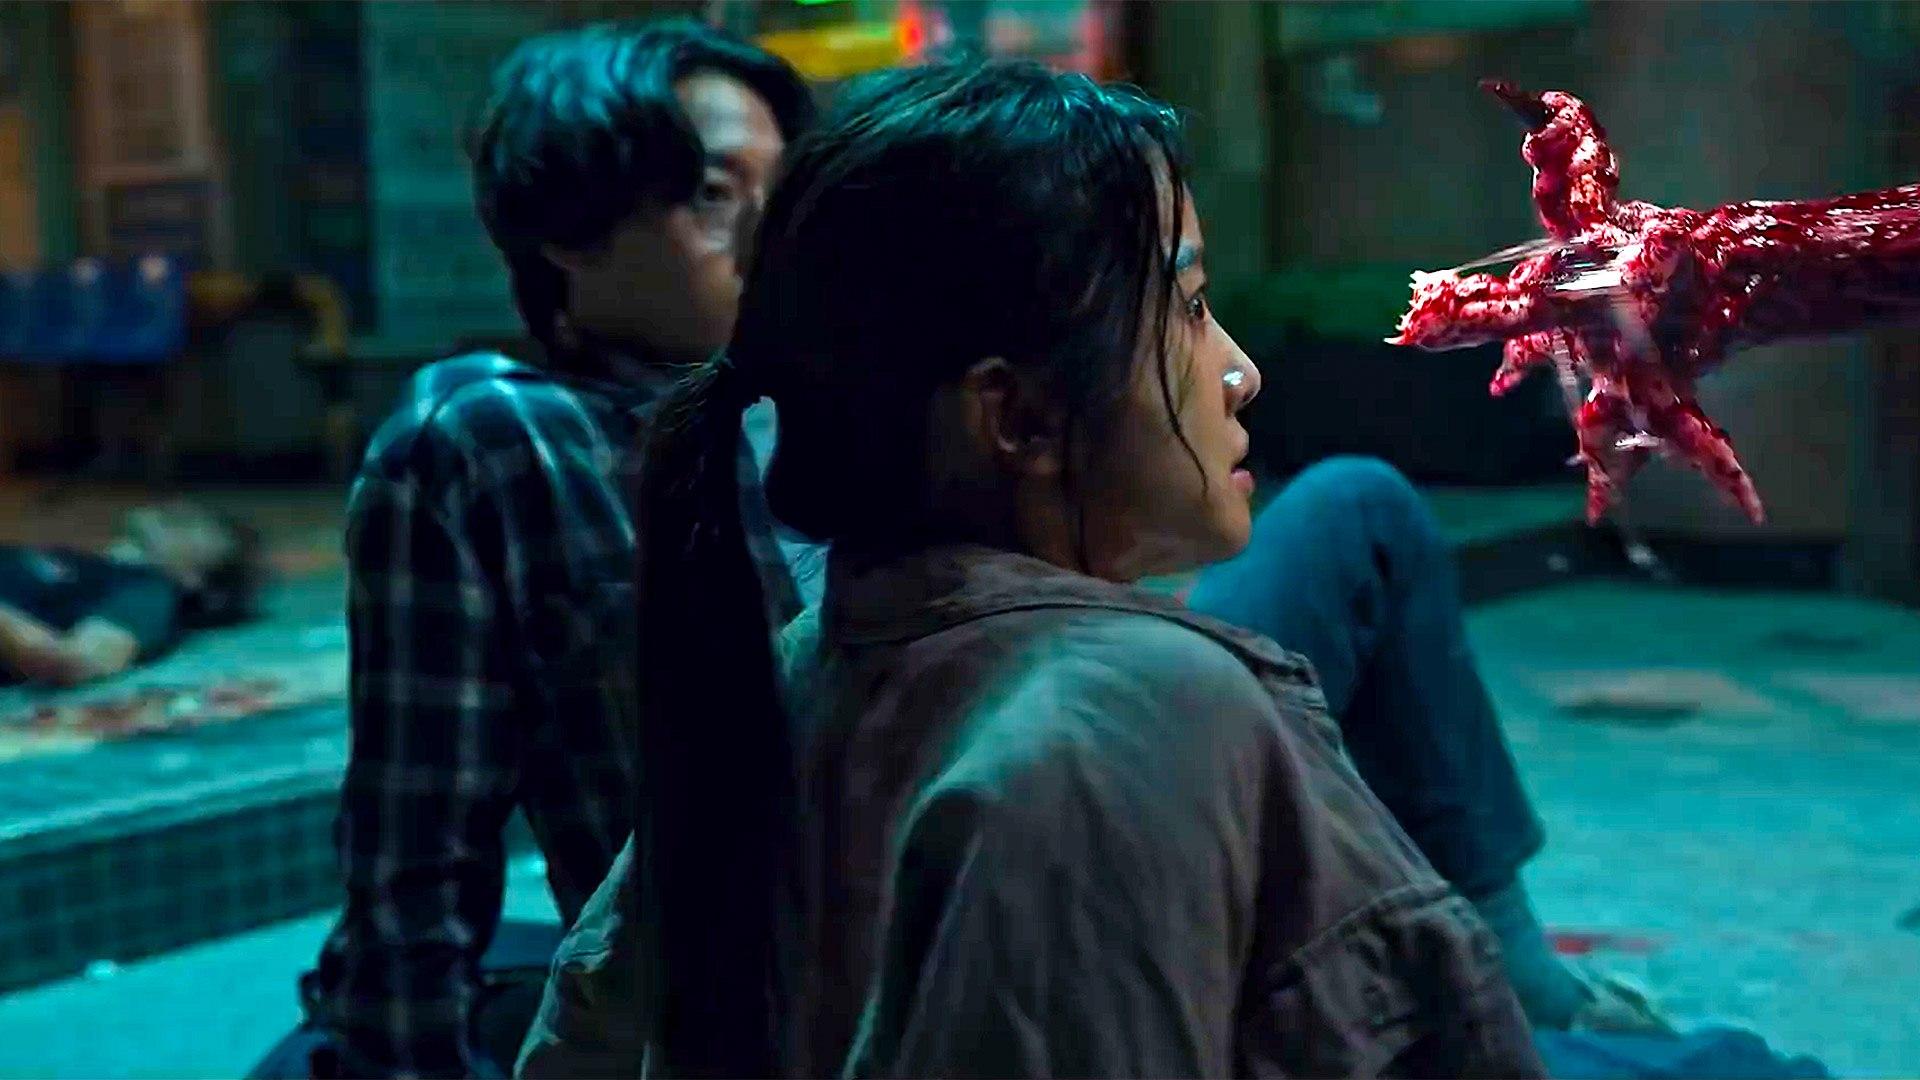 Sweet Home   Netflix divulga trailer da nova série sul-coreana de terror